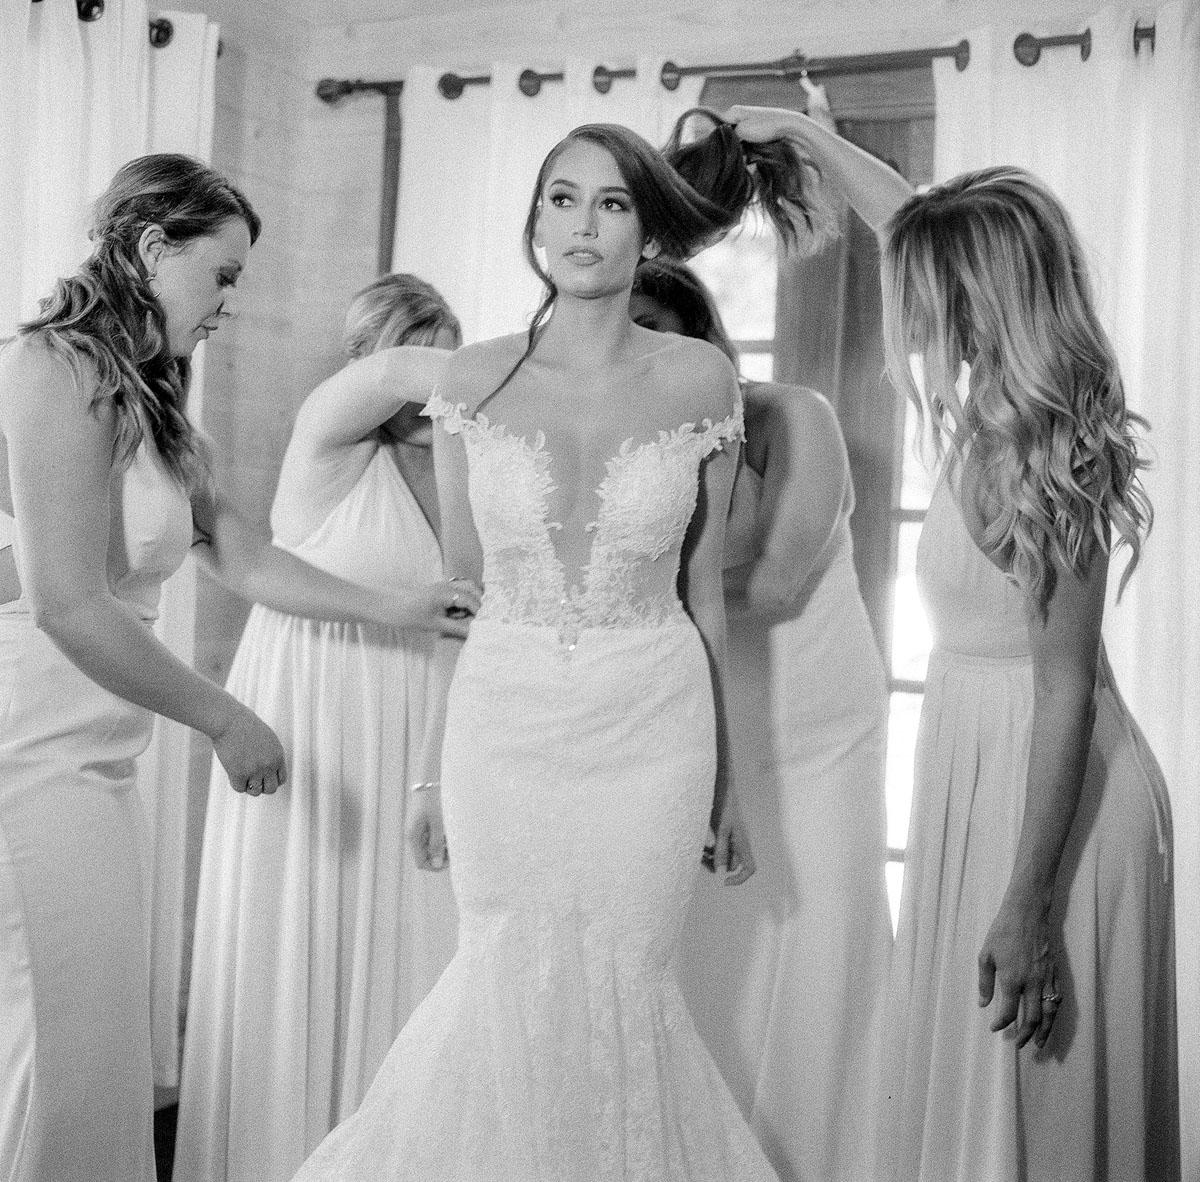 3-hasselblad-wedding-photos.jpg